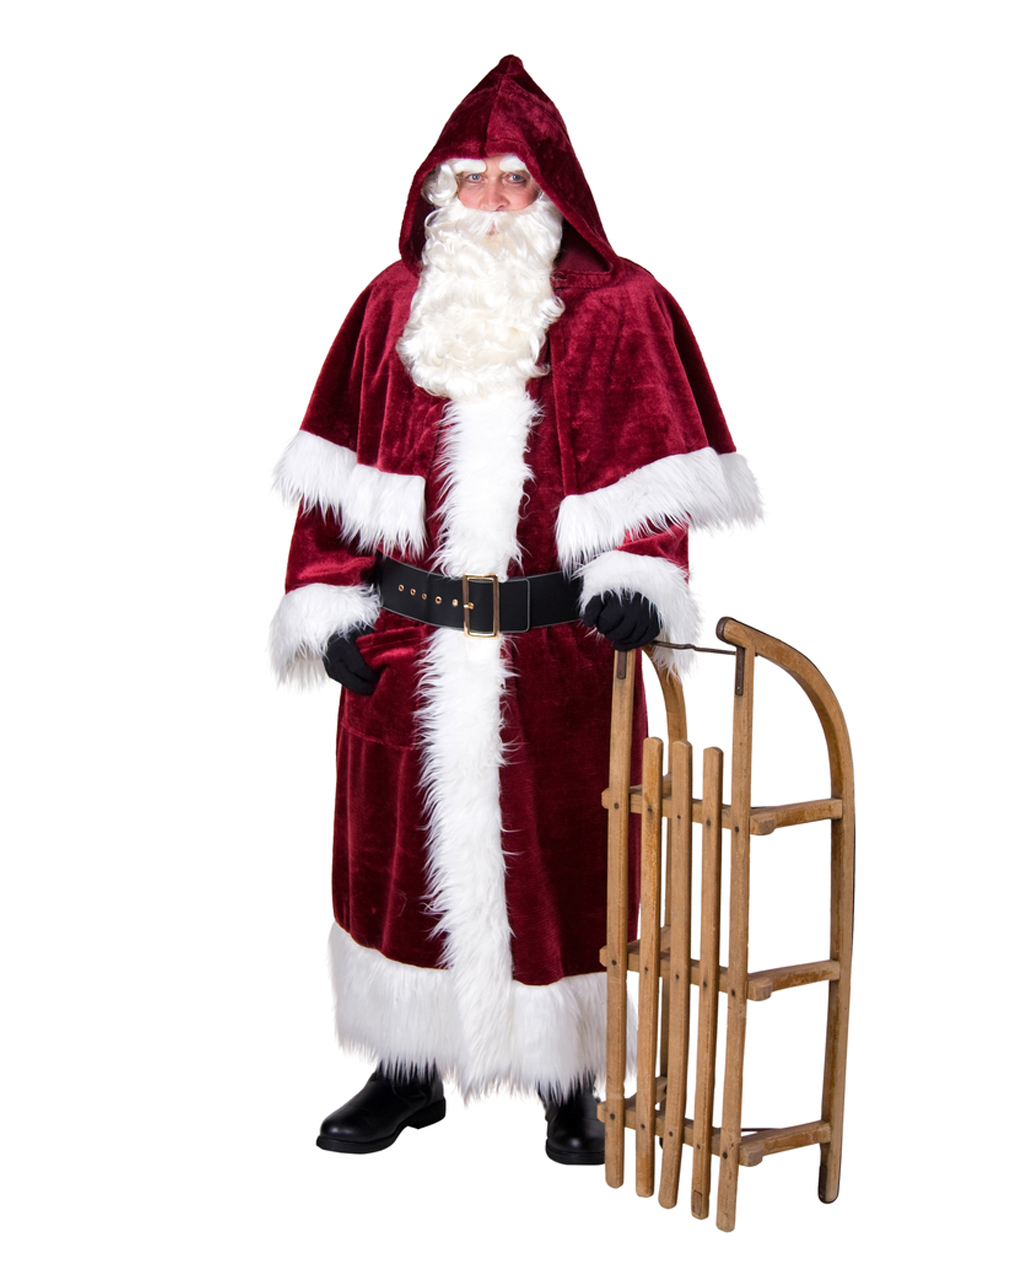 Weihnachtsmann mantel lila